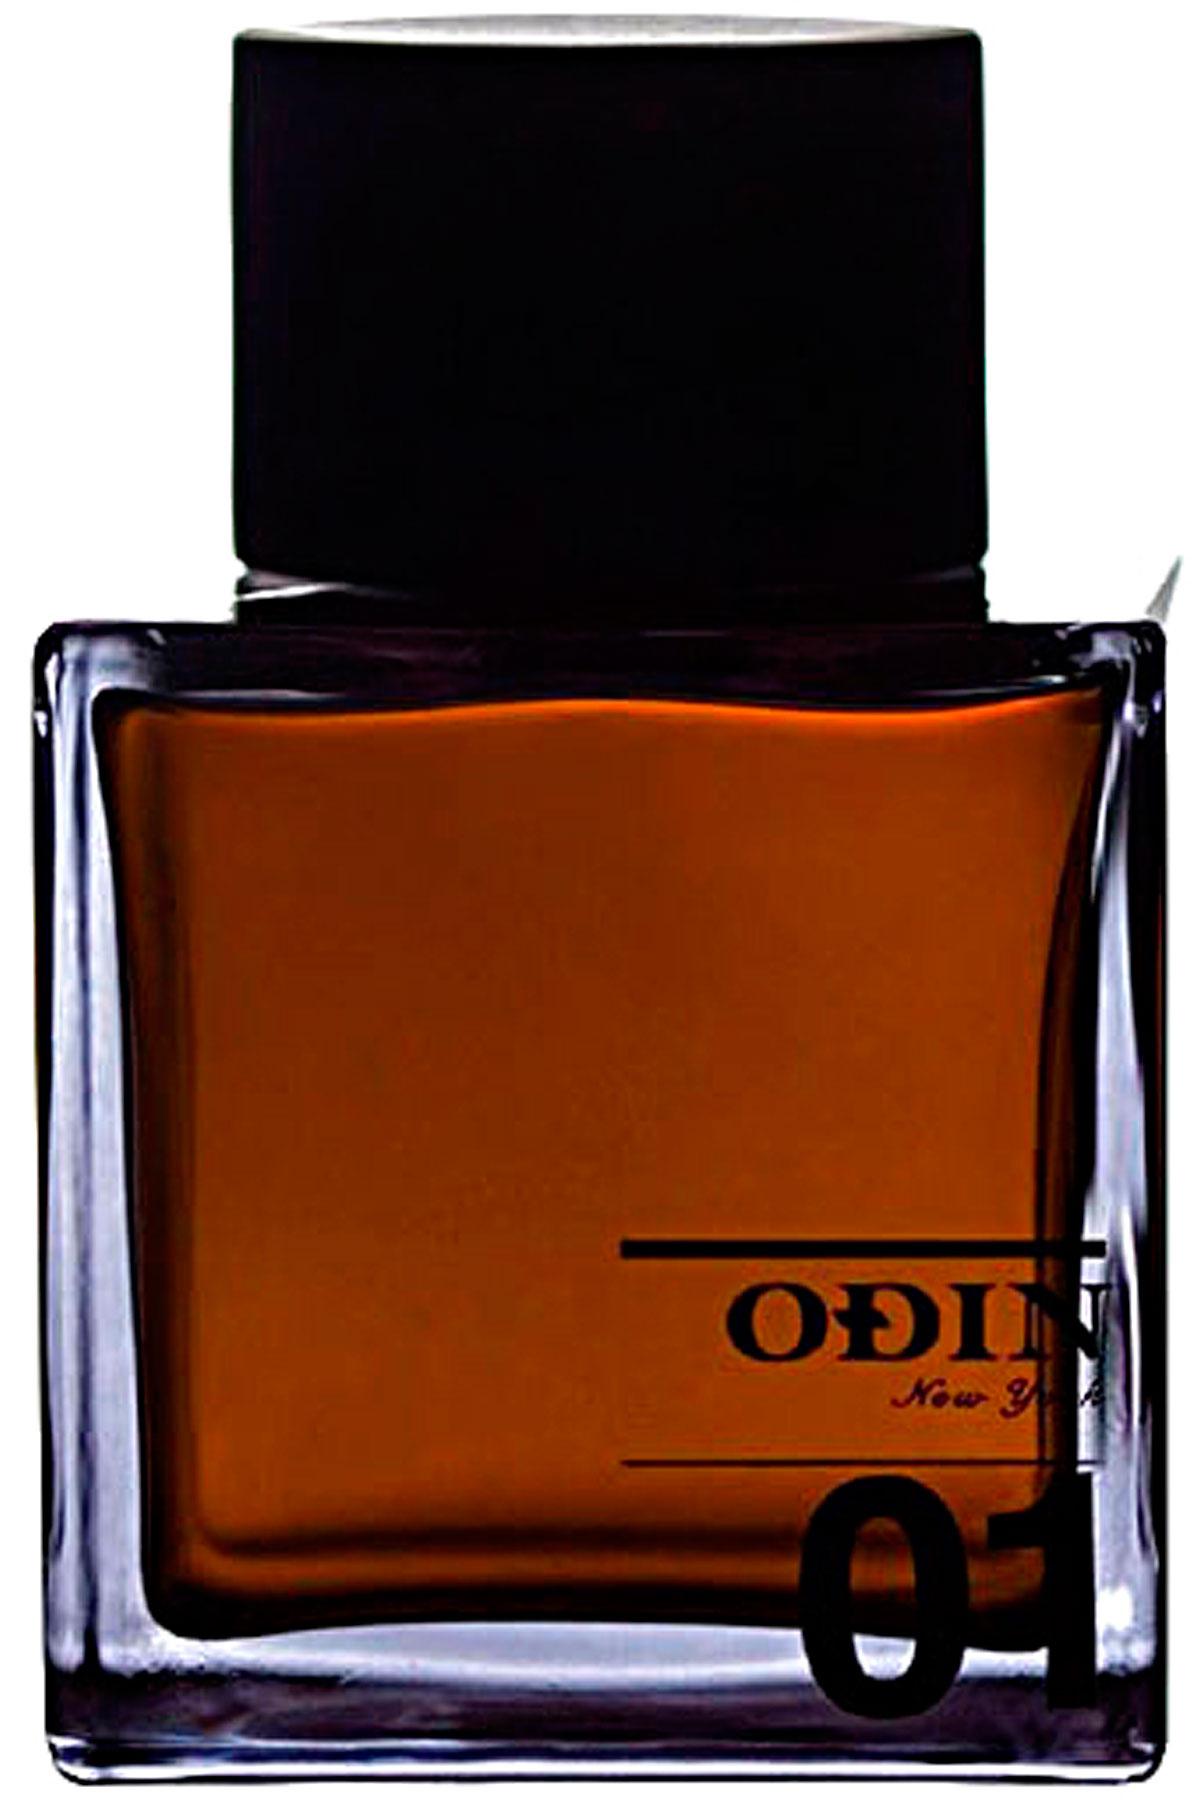 Odin New York Fragrances for Men On Sale, 01 Sunda - Eau De Parfum - 100 Ml, 2019, 100 ml